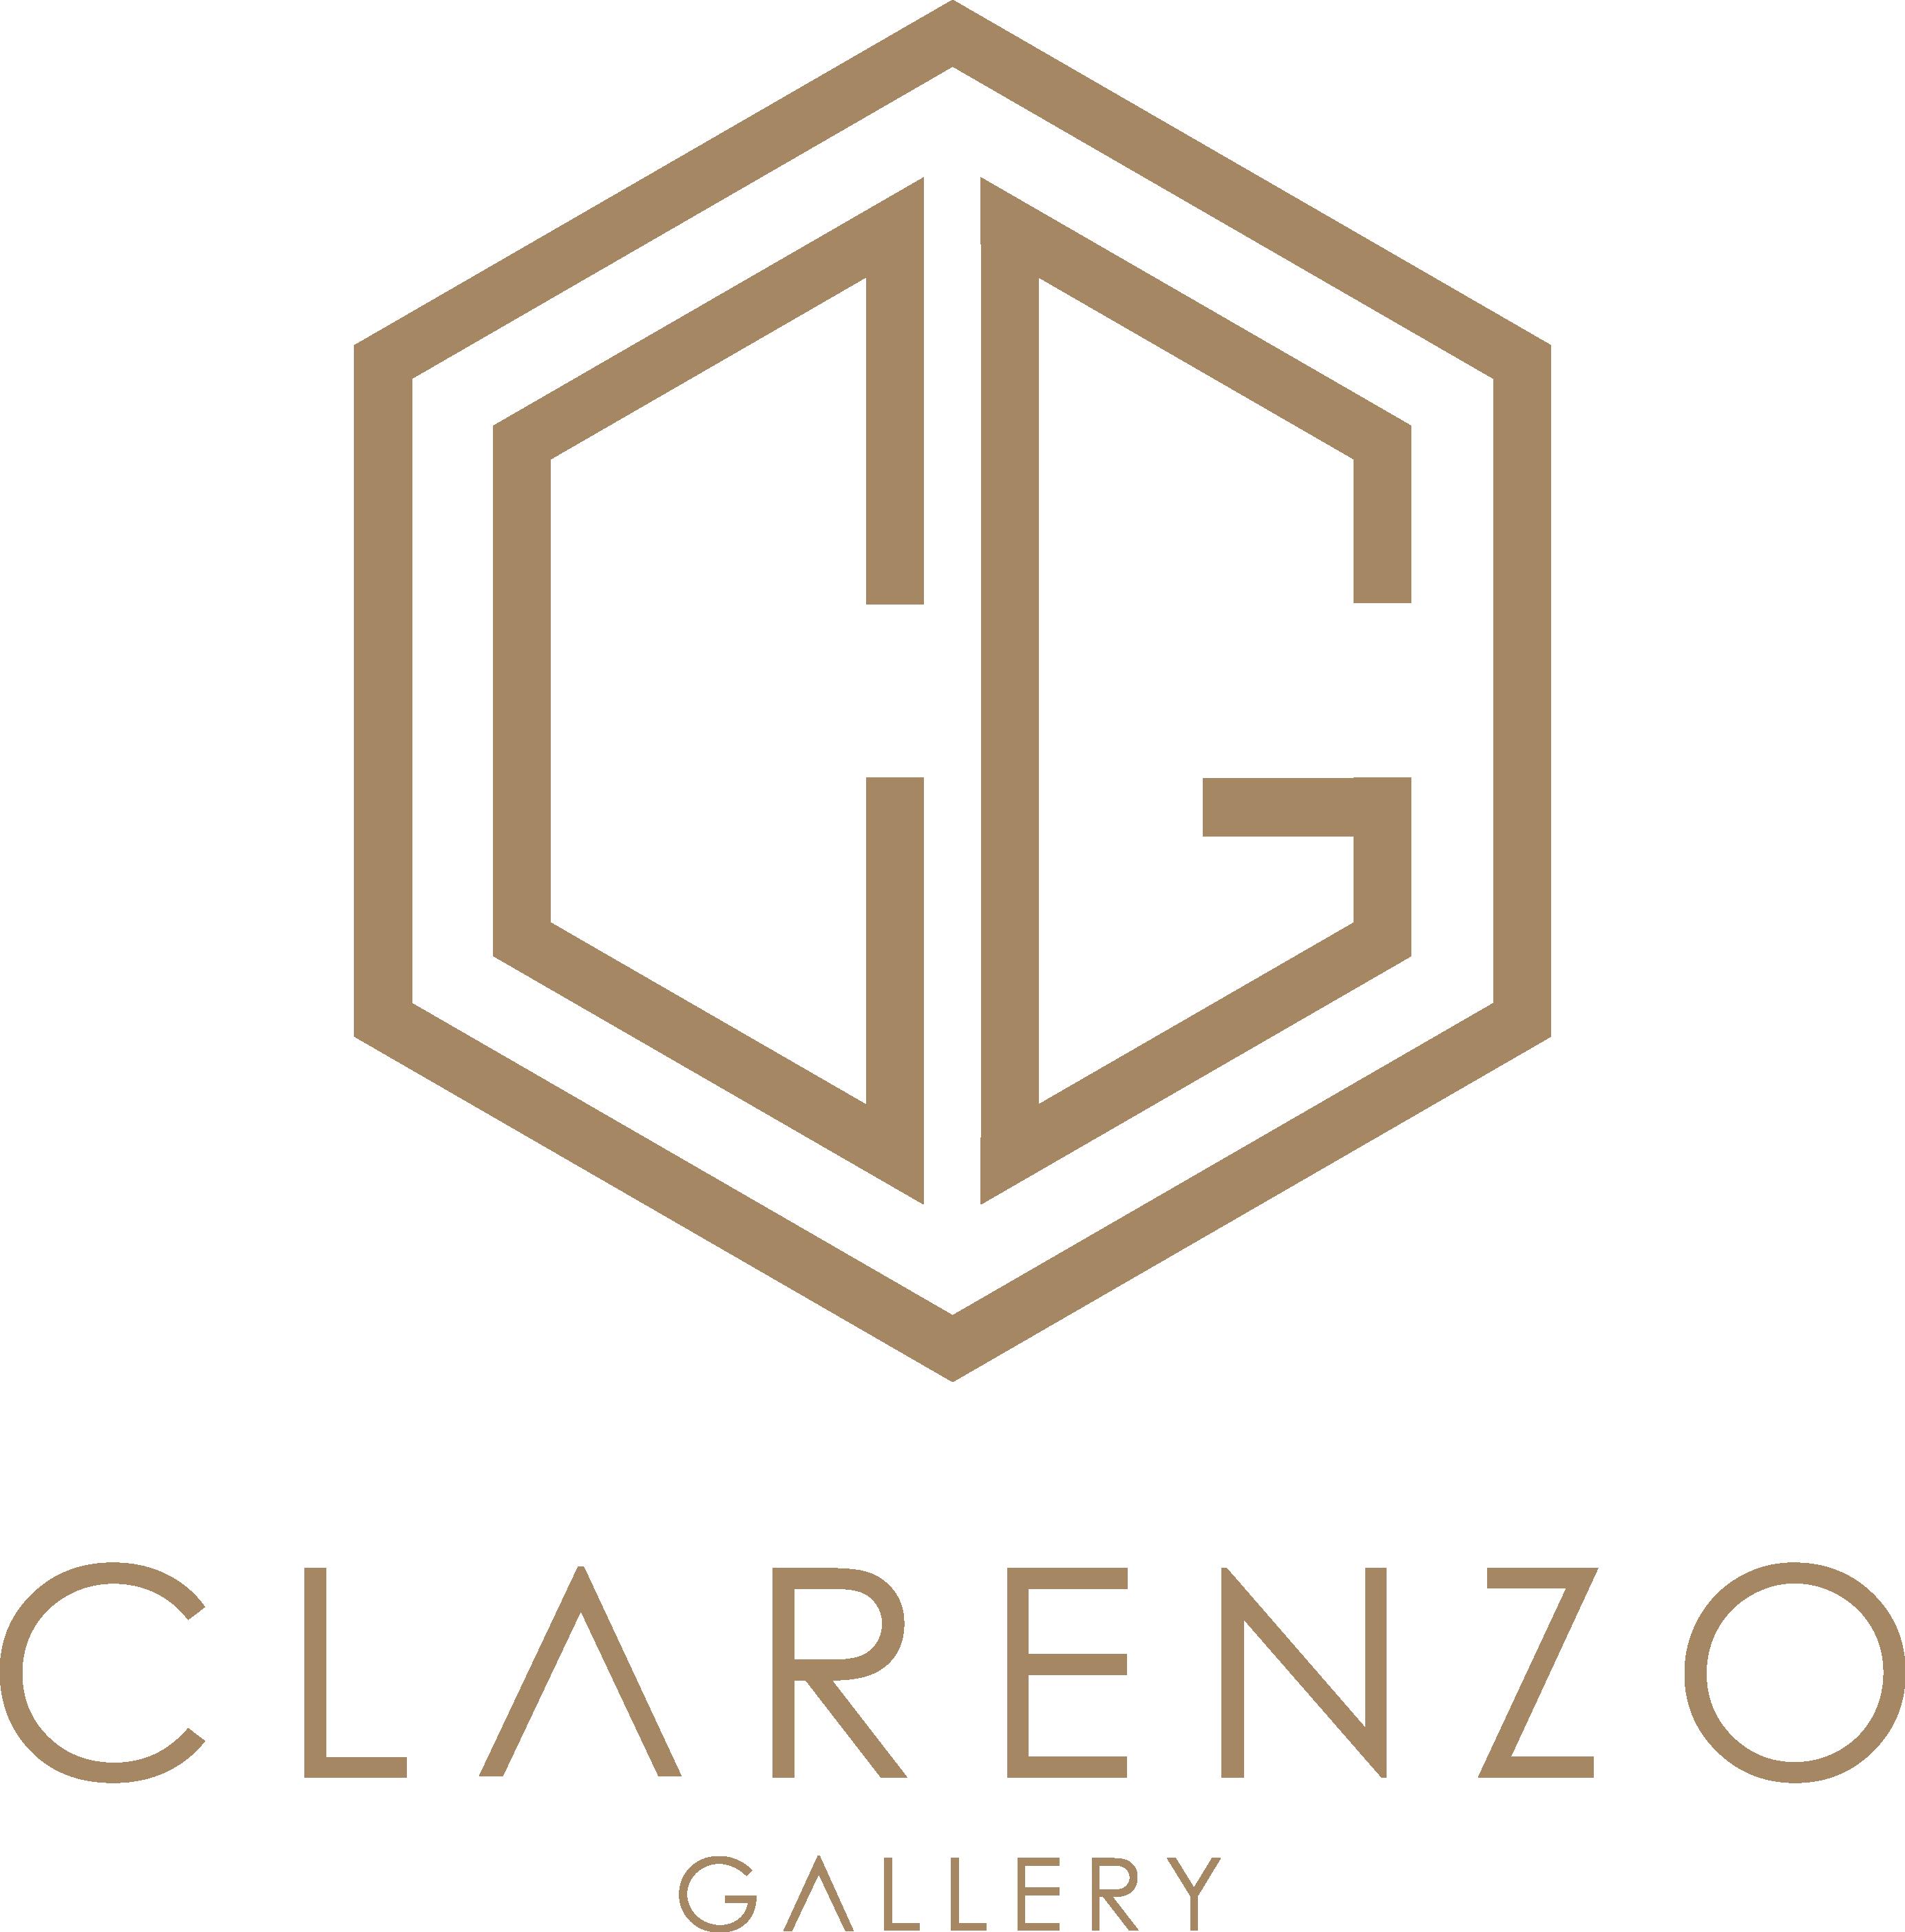 Clarenzo Gallery